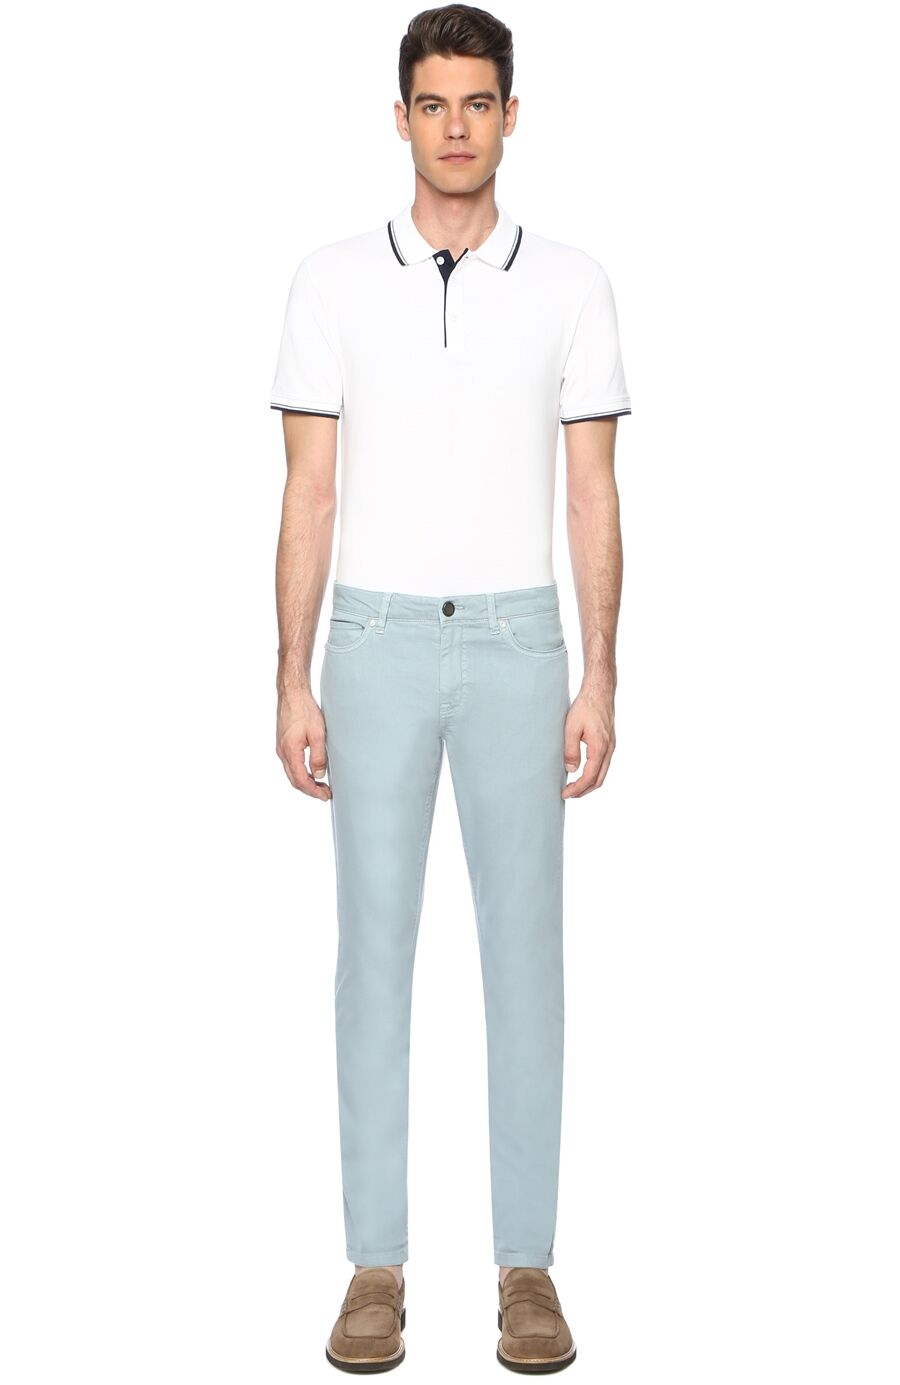 Diyagonal Slım Fit Koyu Mint Casual Pantolon